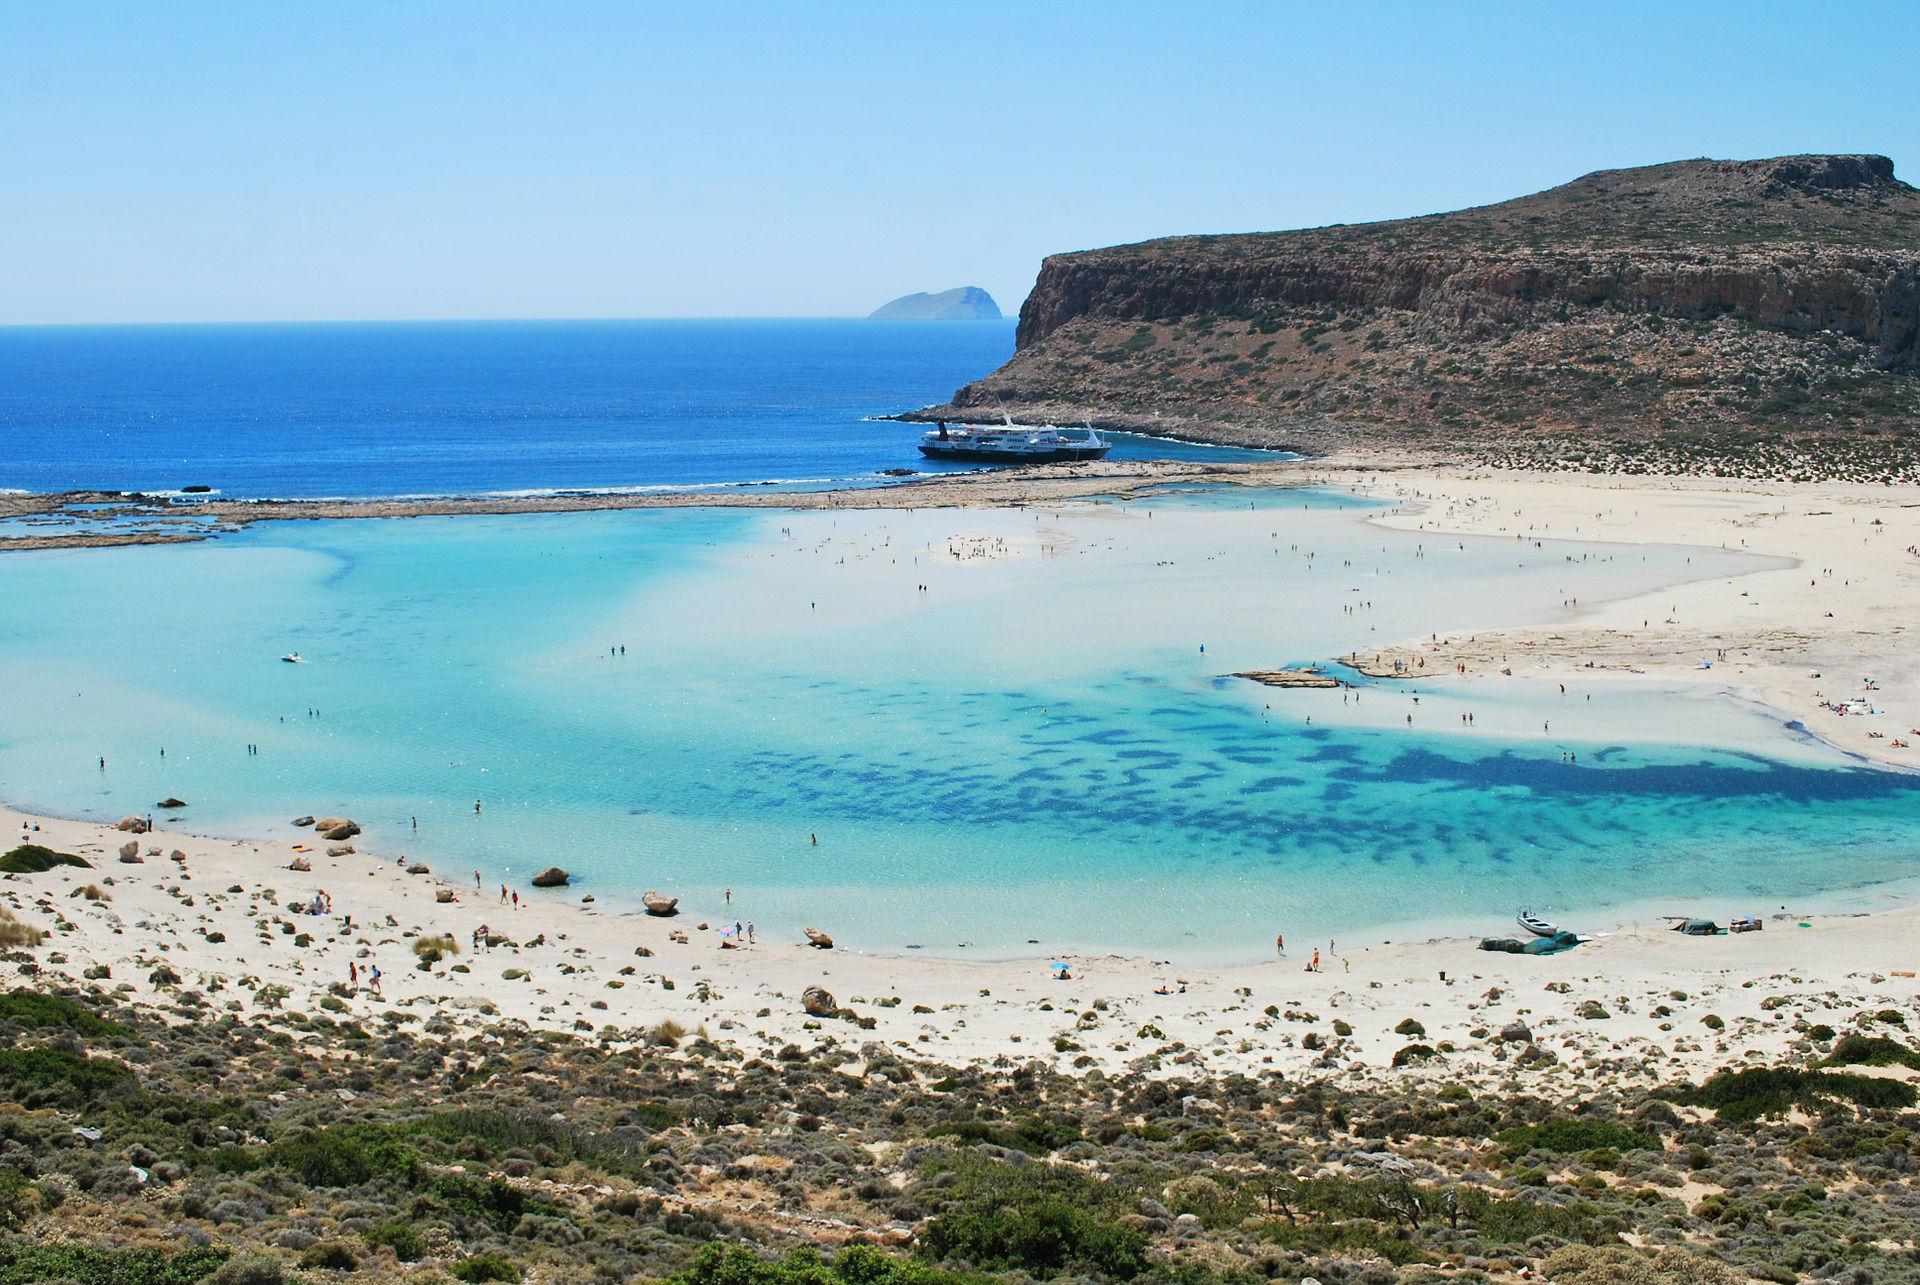 The lagoon Balos on Crete